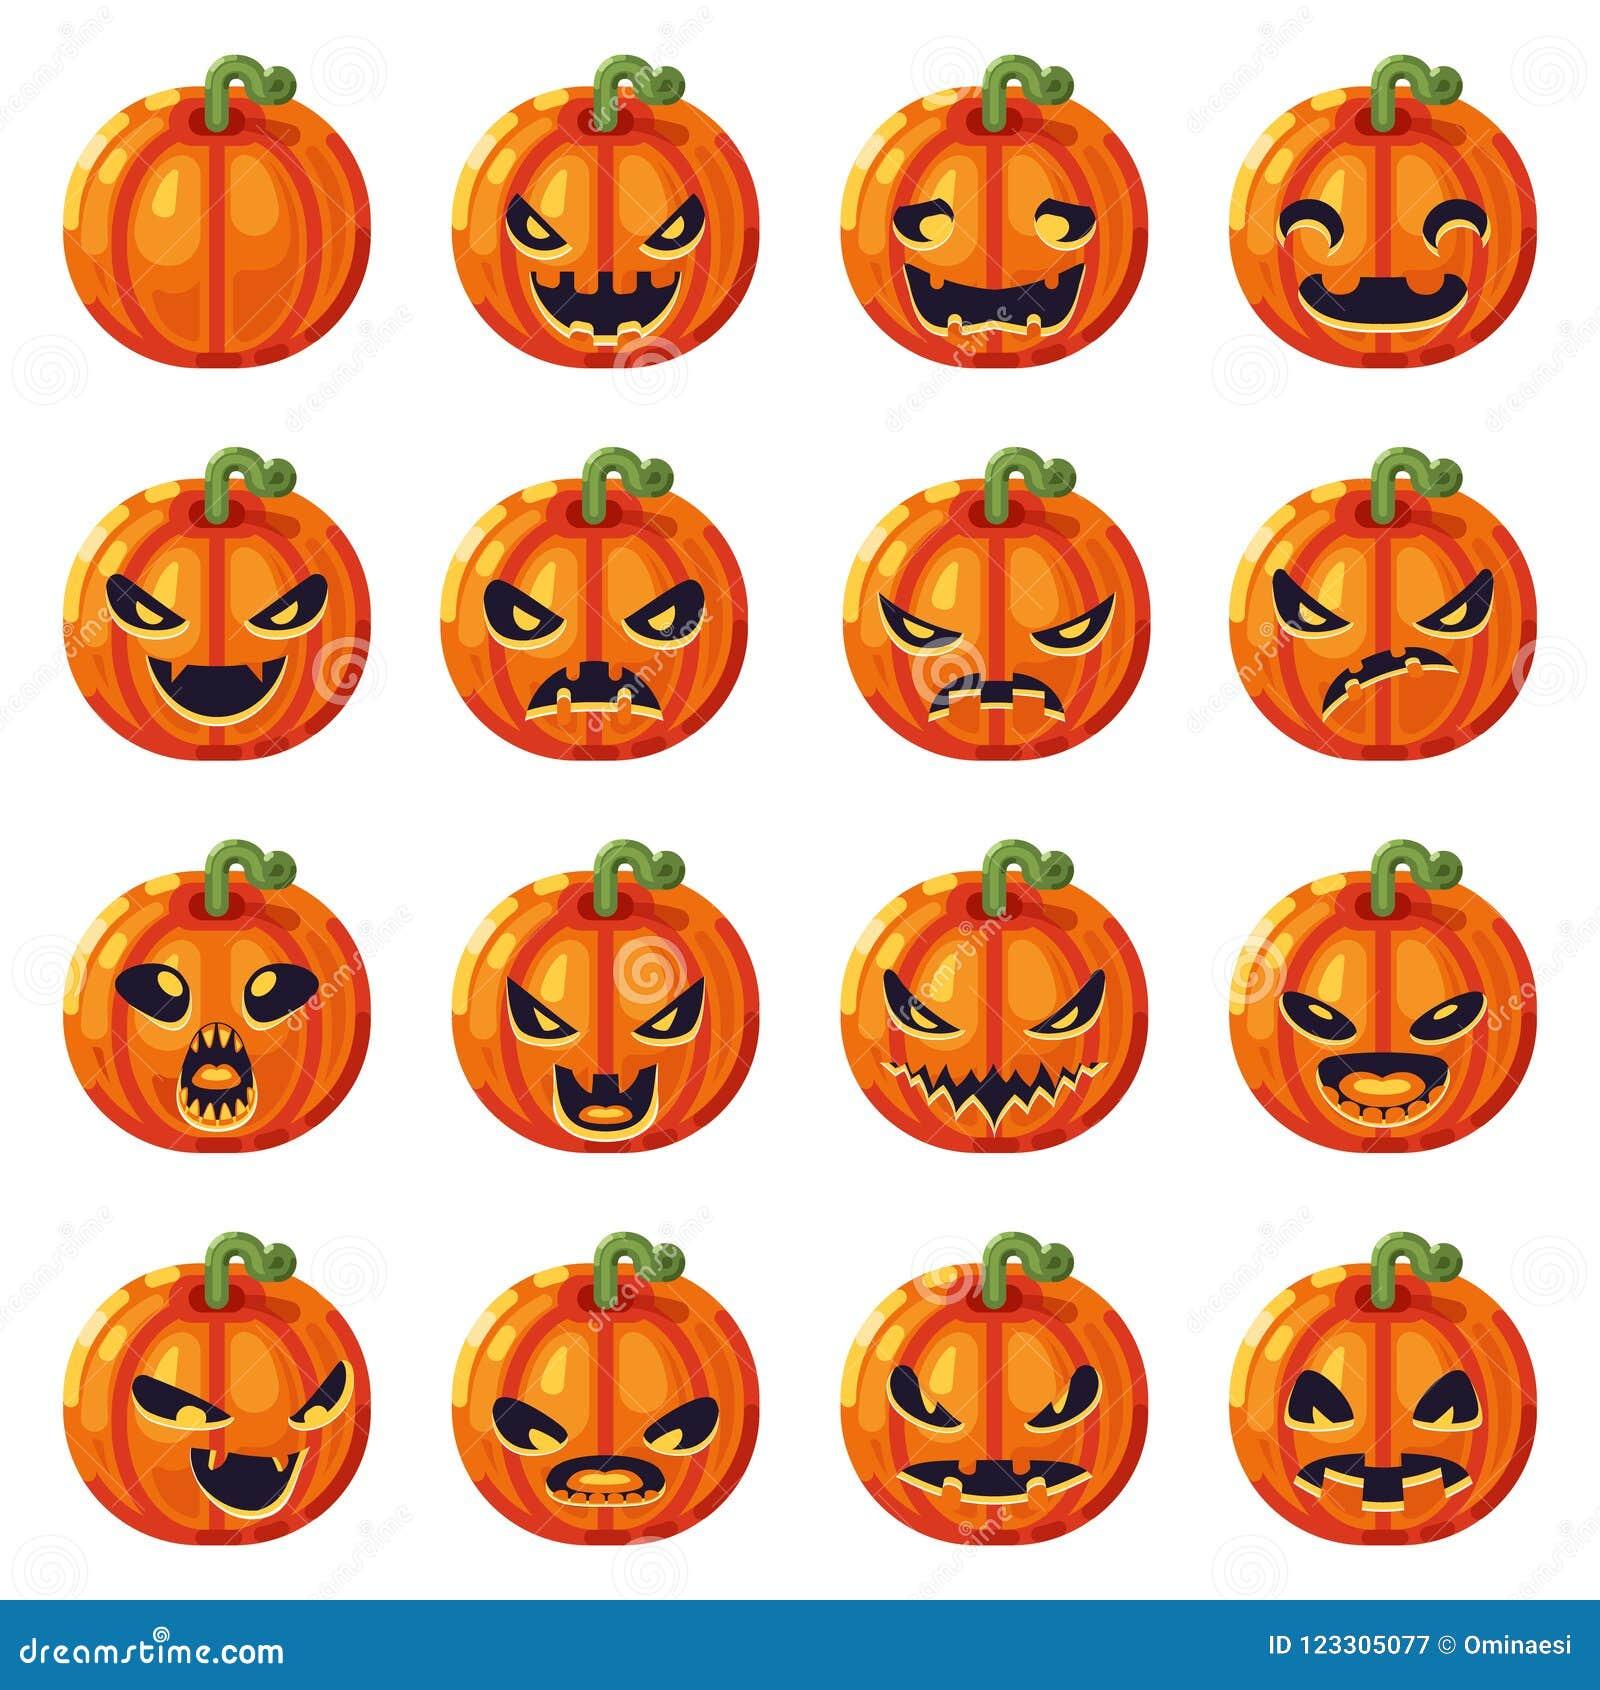 halloween pumpkin decoration scary faces smile emoji icons set